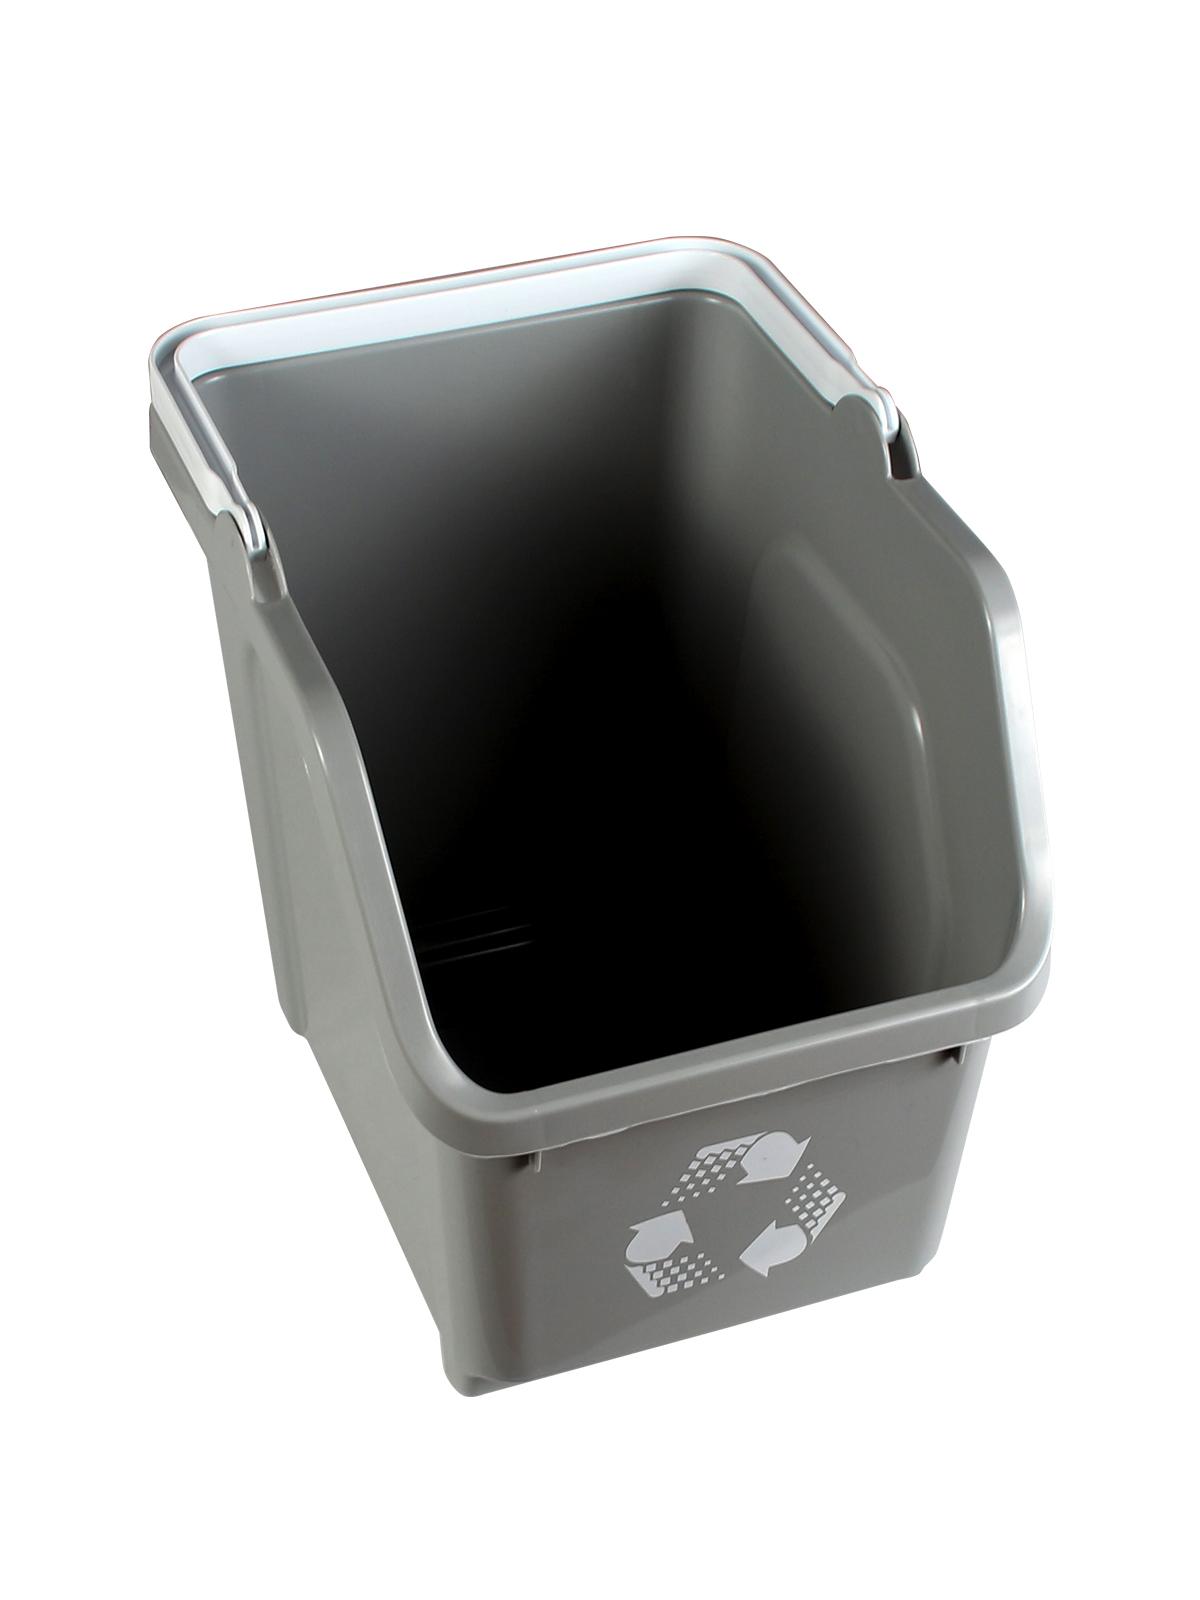 MULTI RECYCLER - Single - Body - Mobius Loop - Executive Grey